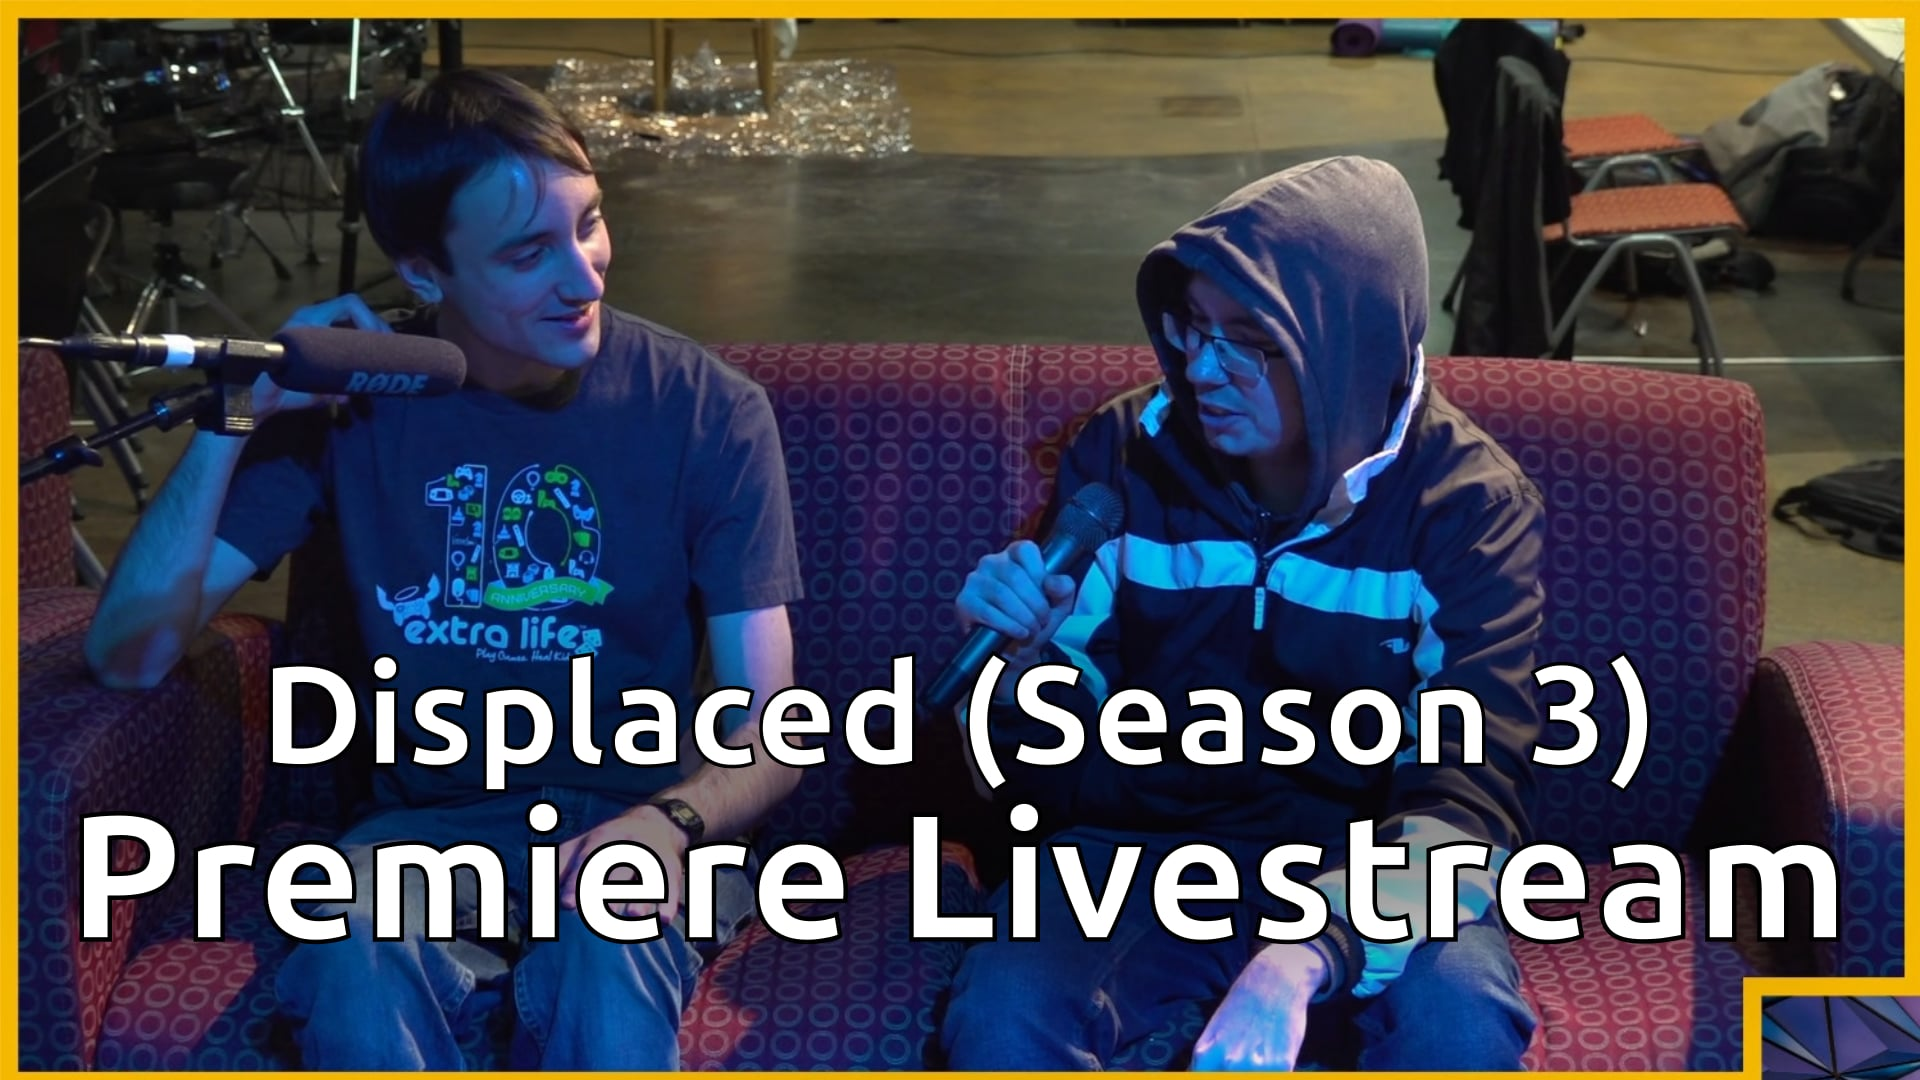 Displaced (Season 3) Premiere Livestream